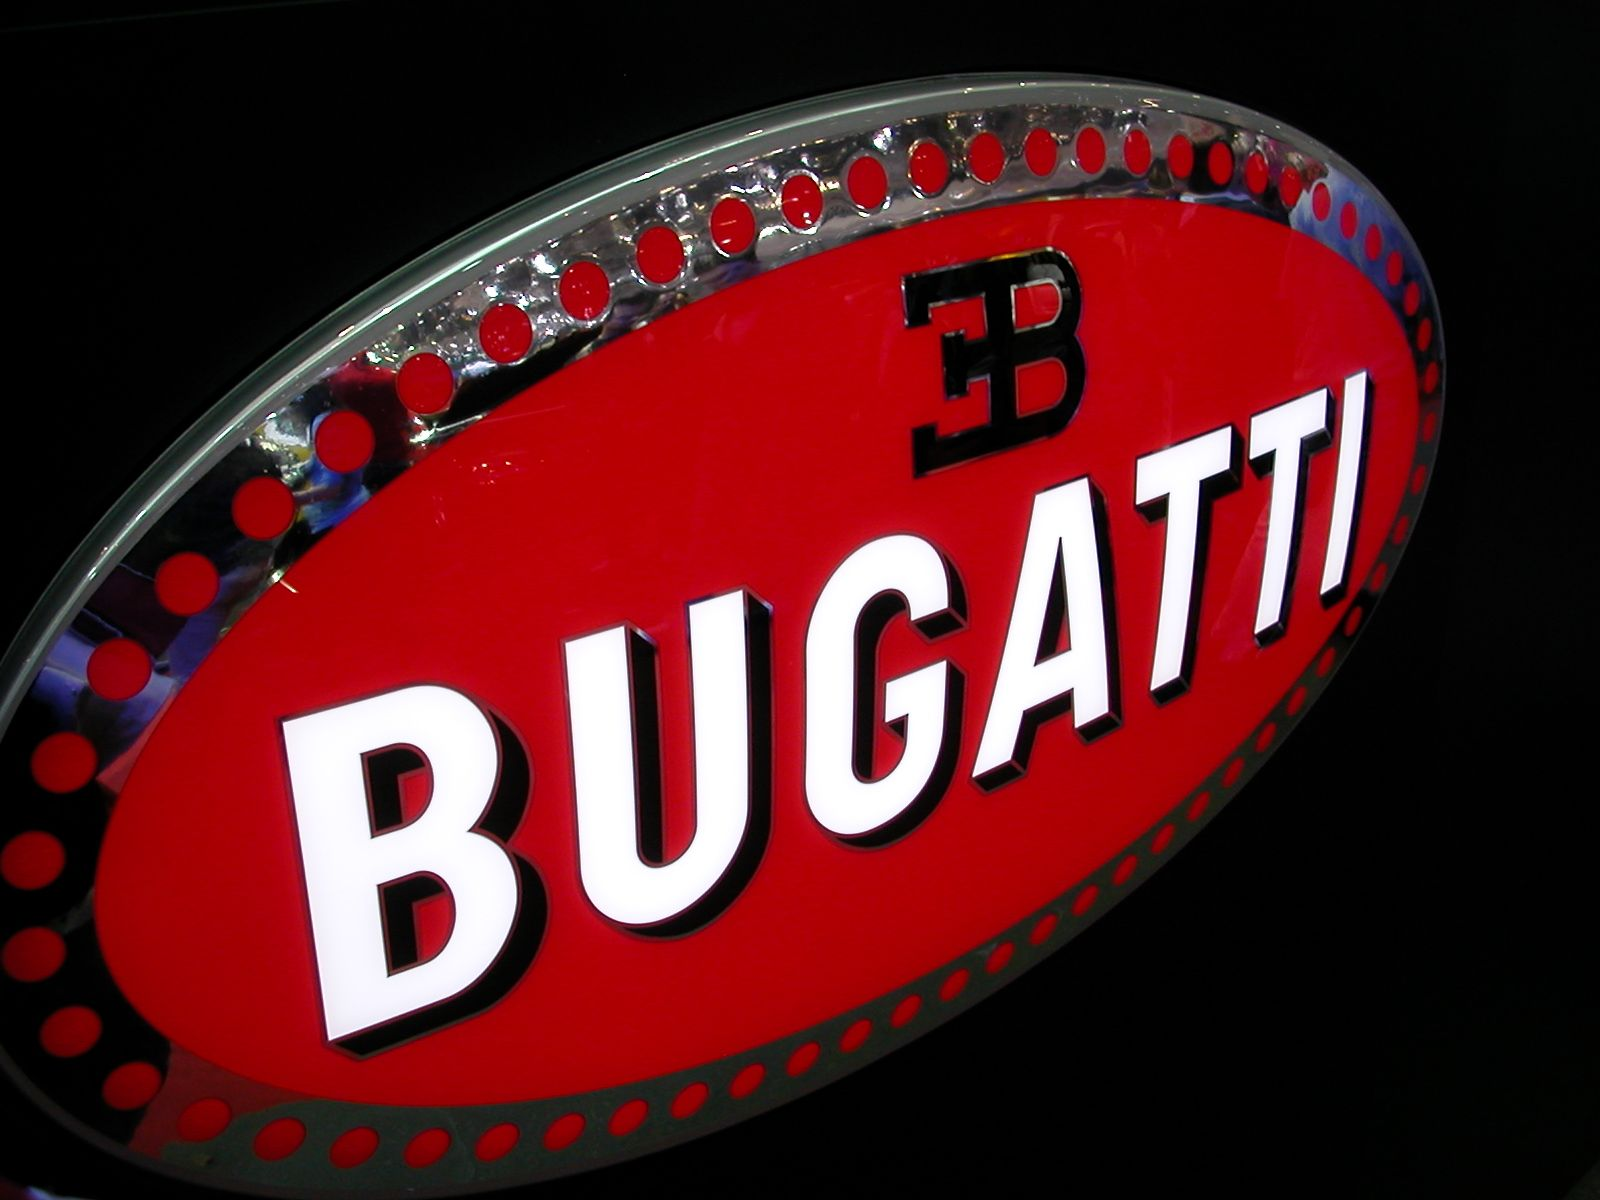 Bugatti wallpaper Yummy ) Pinterest Wallpaper